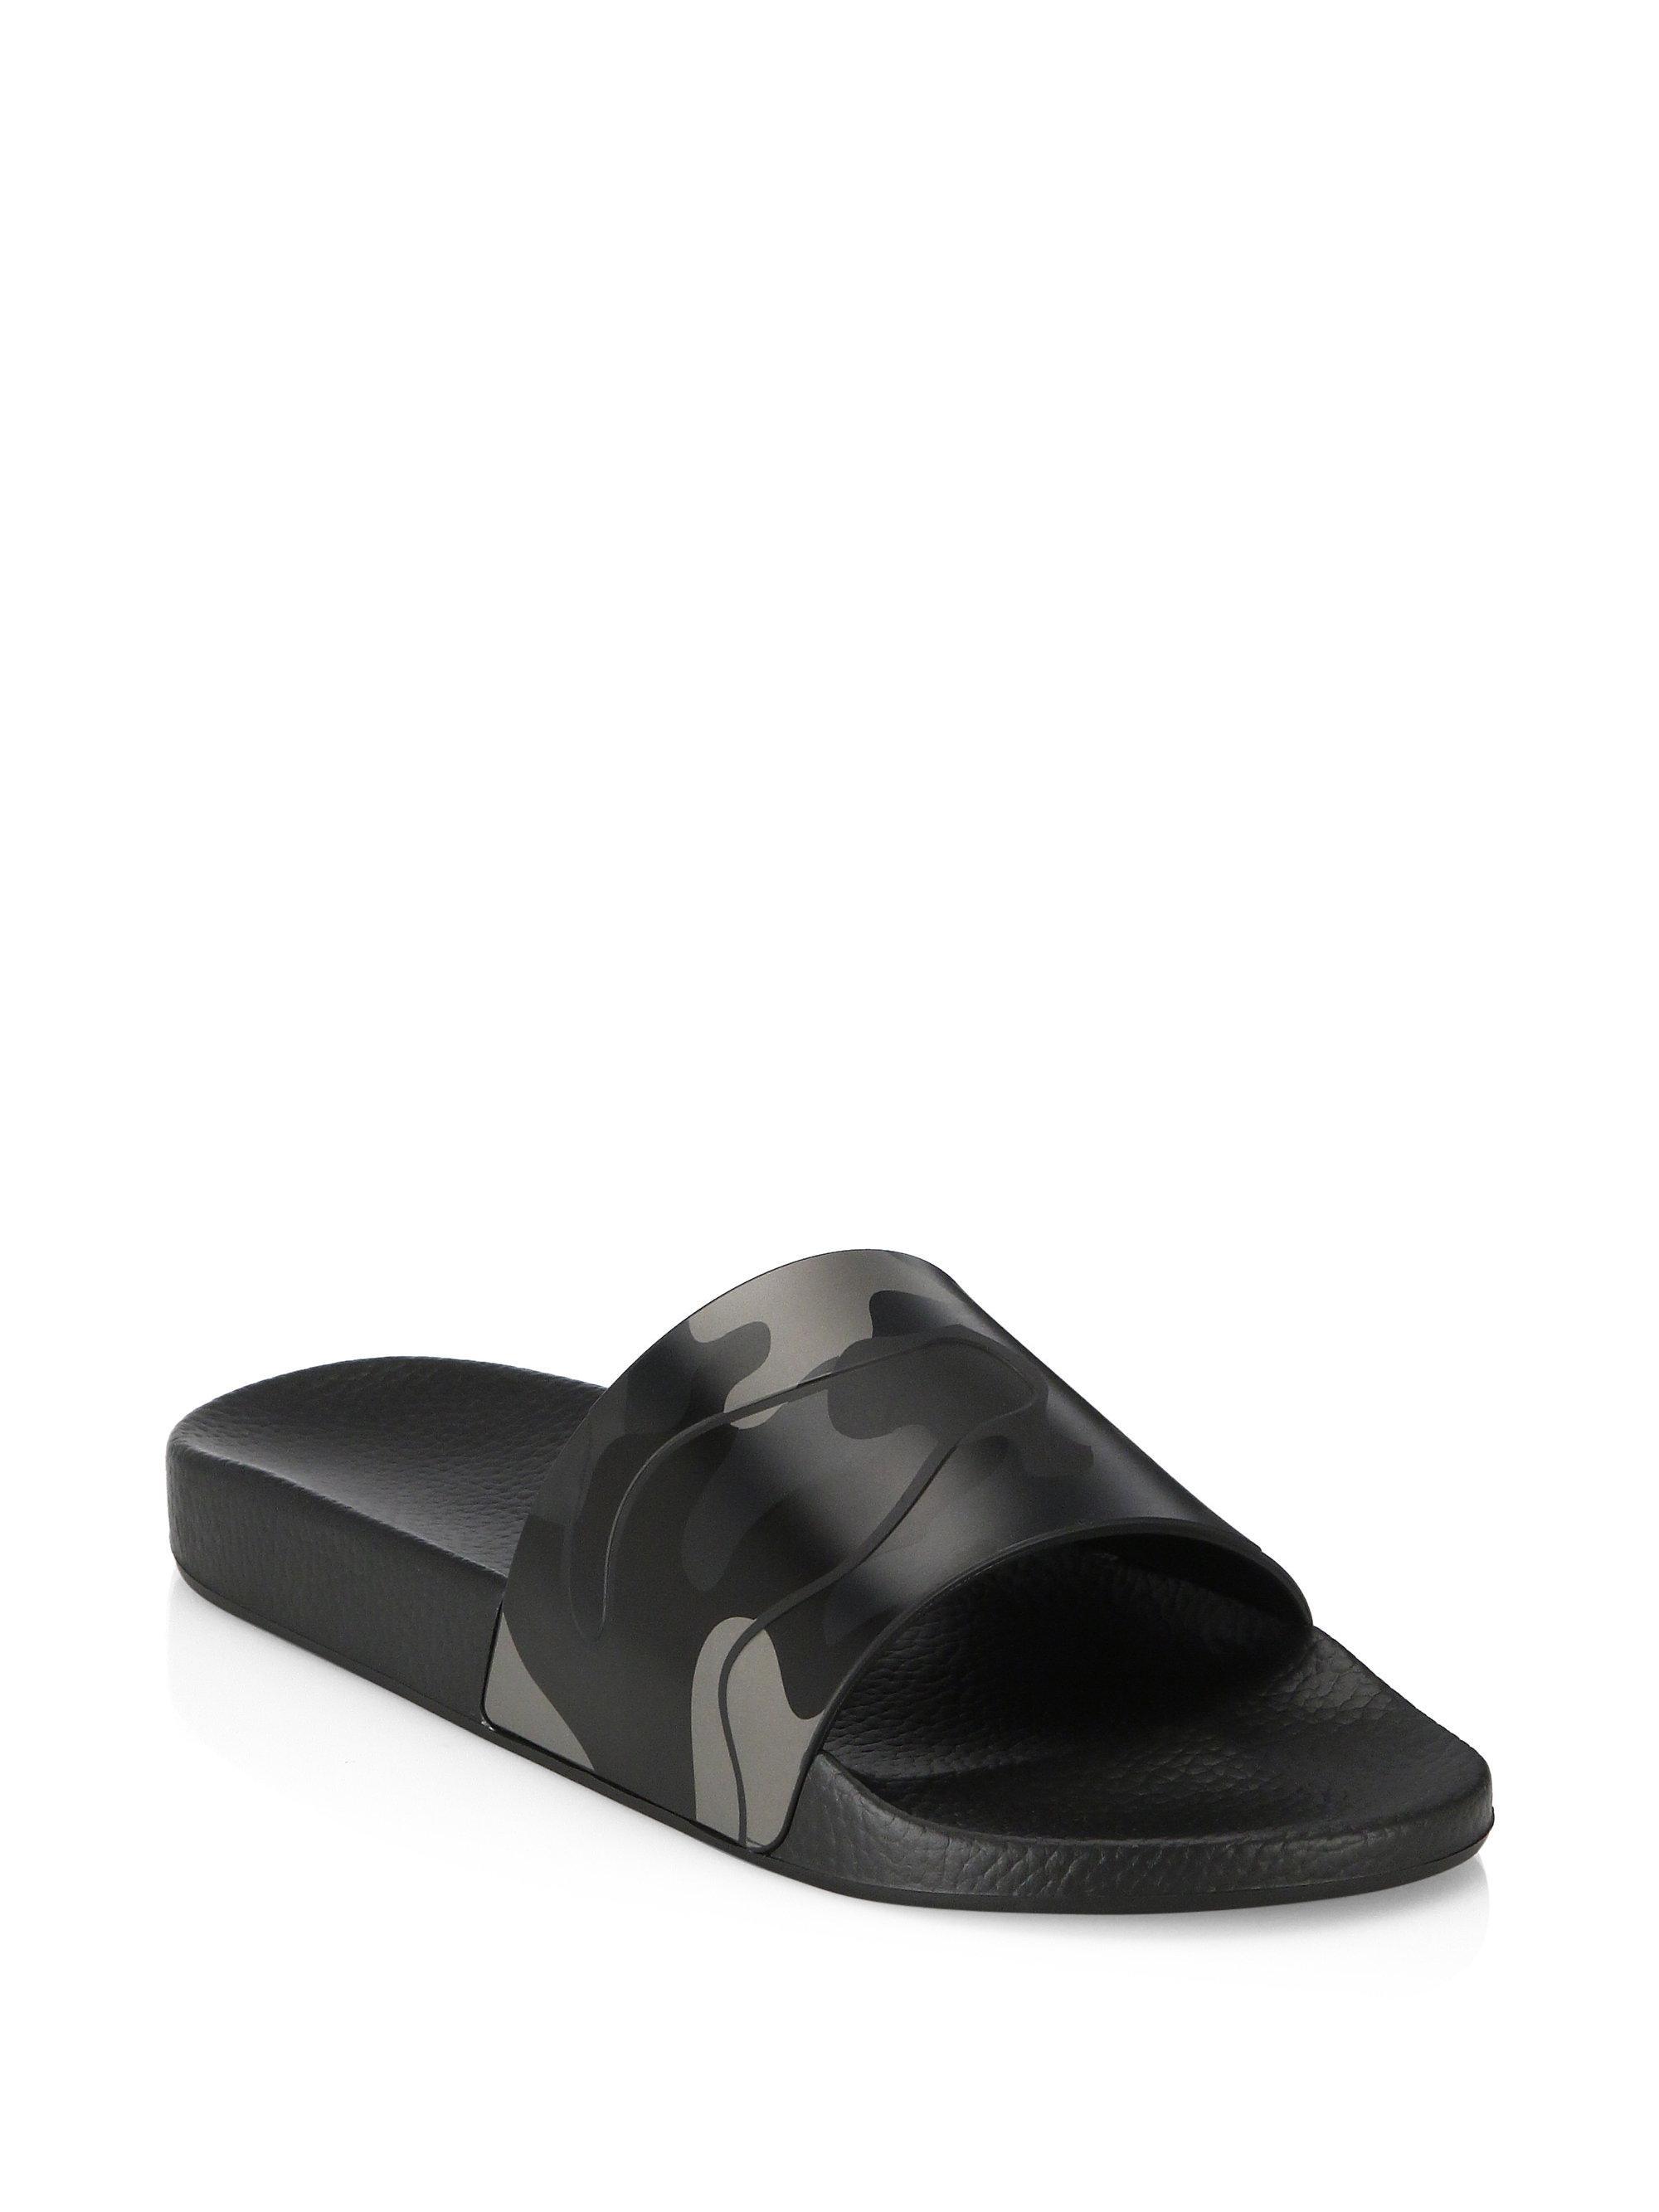 cd4bb3e06d88 Lyst - Valentino Camo Rubber Slides in Black for Men